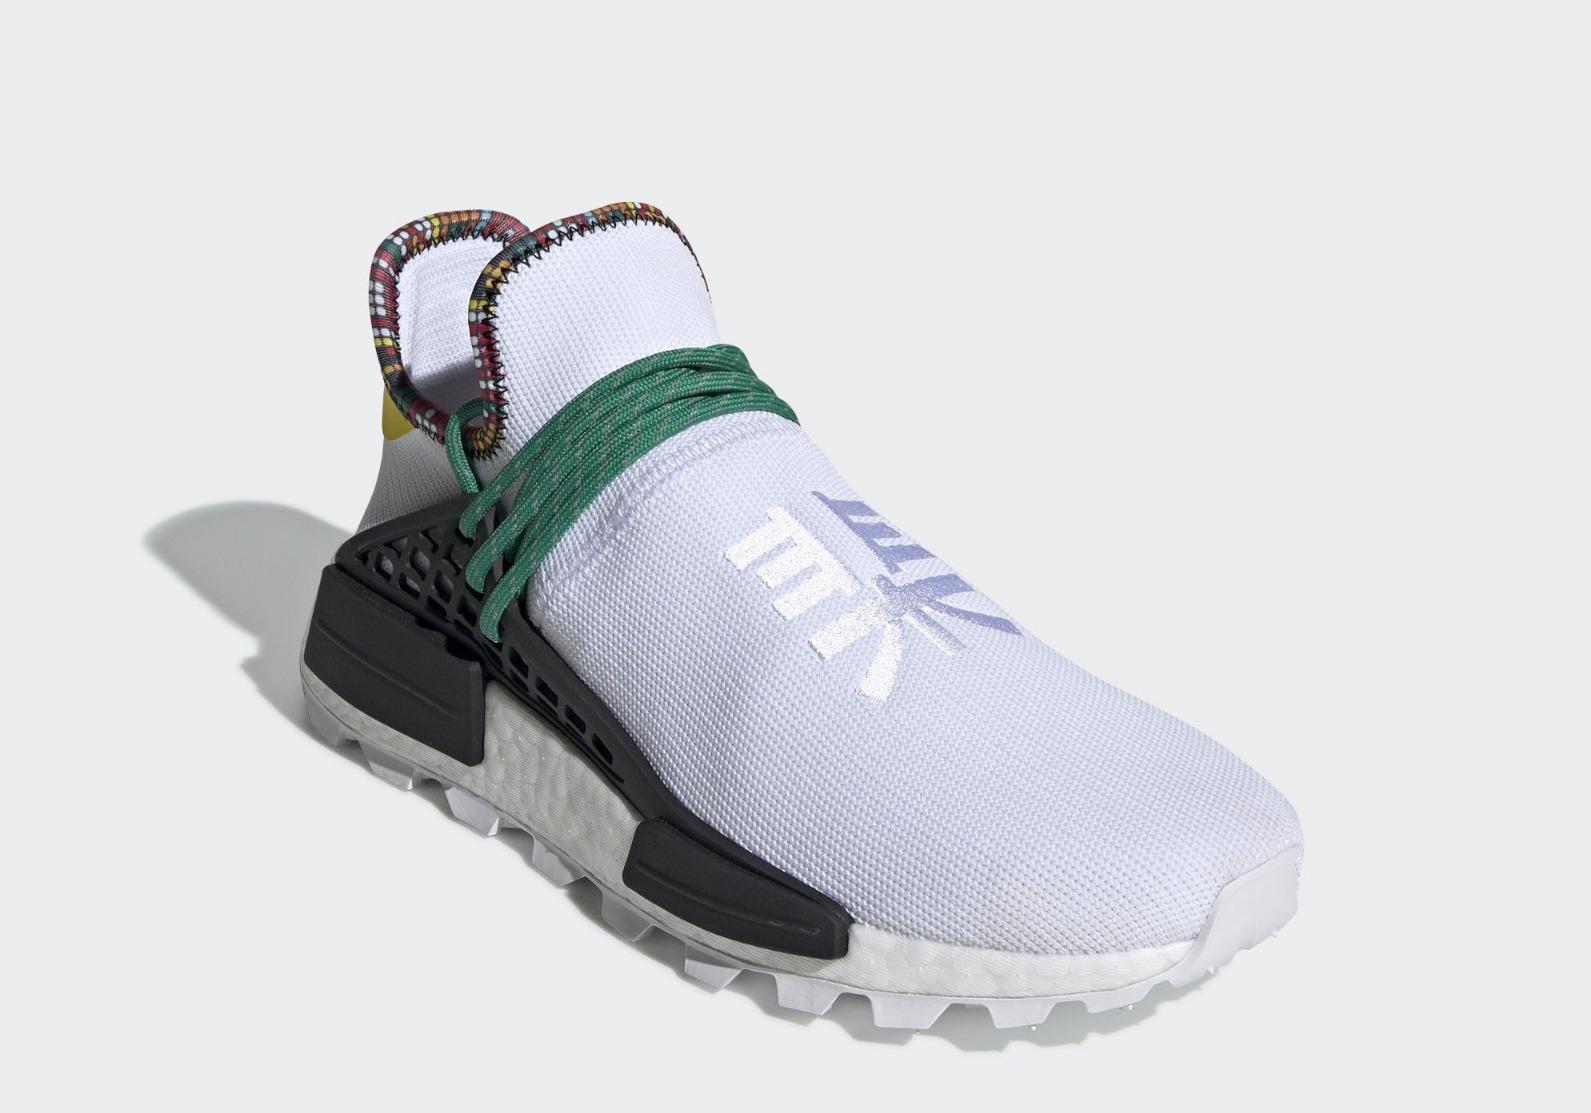 Adidas NMD Human Race Pharrell